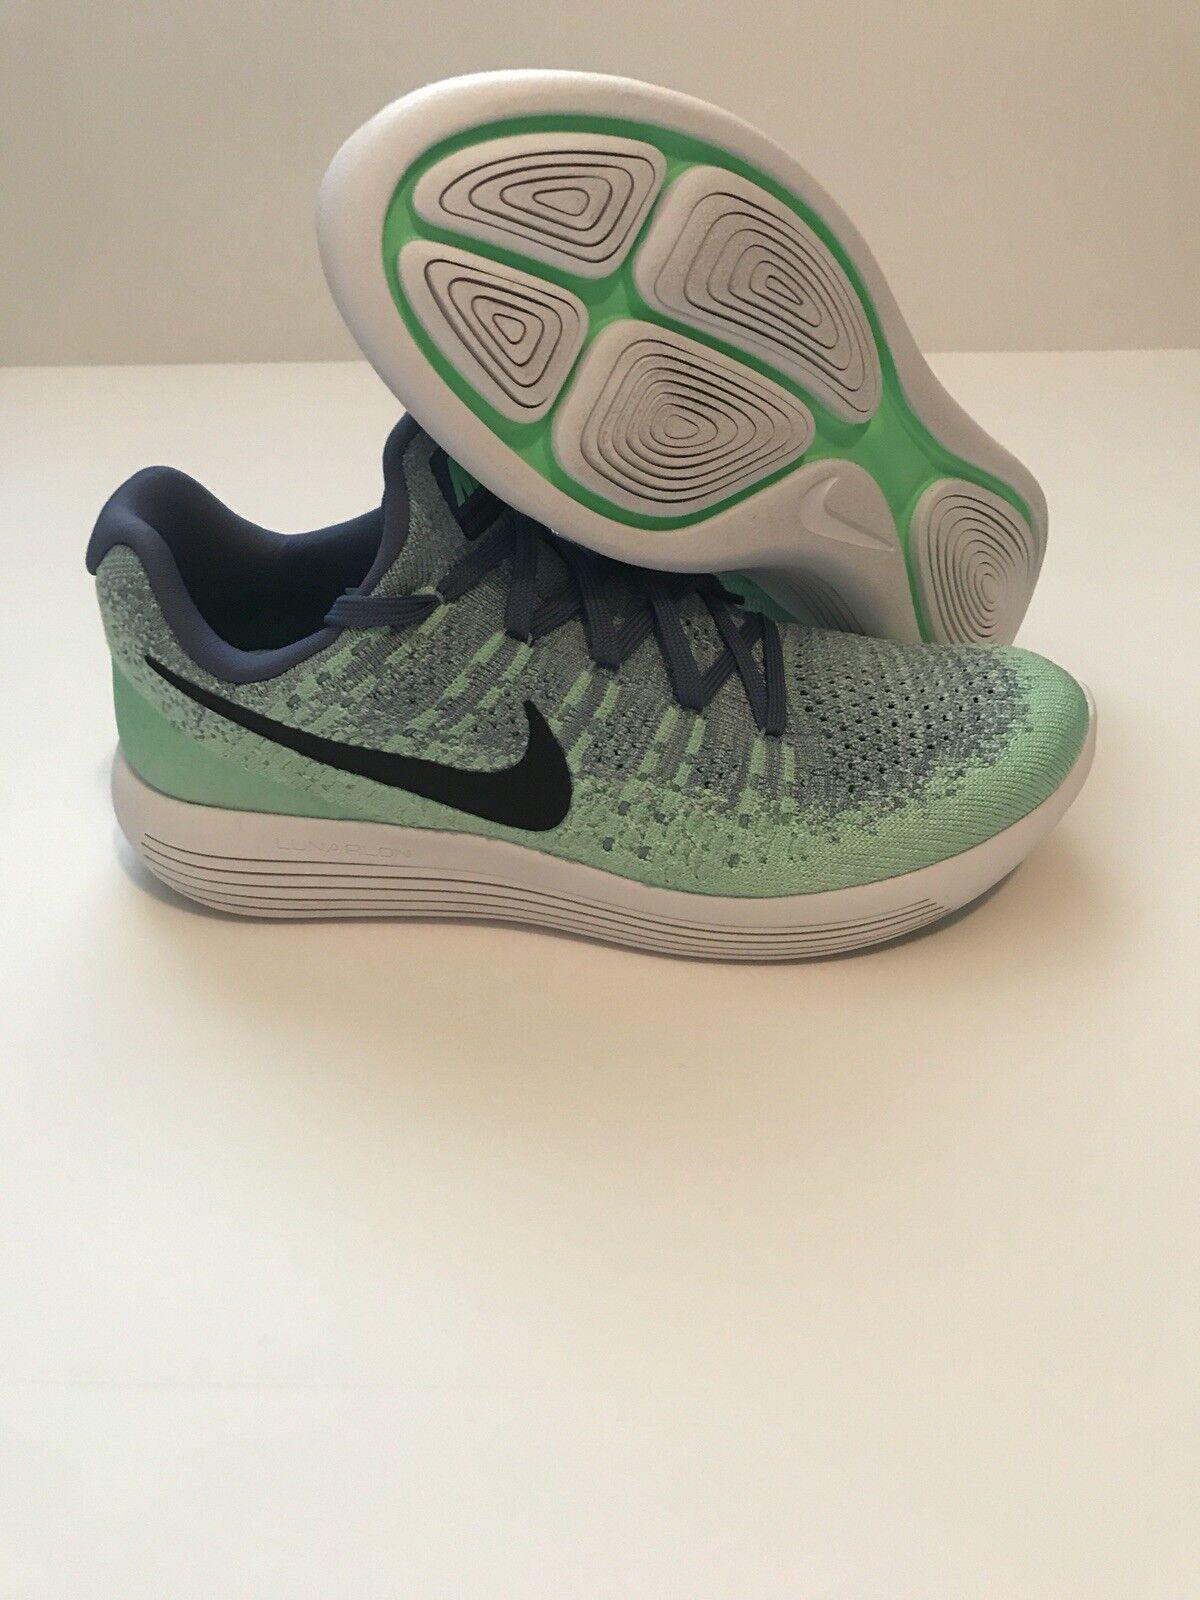 New Nike Womens Lunarepic Low Flyknit 2 Blue Moon Running Shoes sz 10